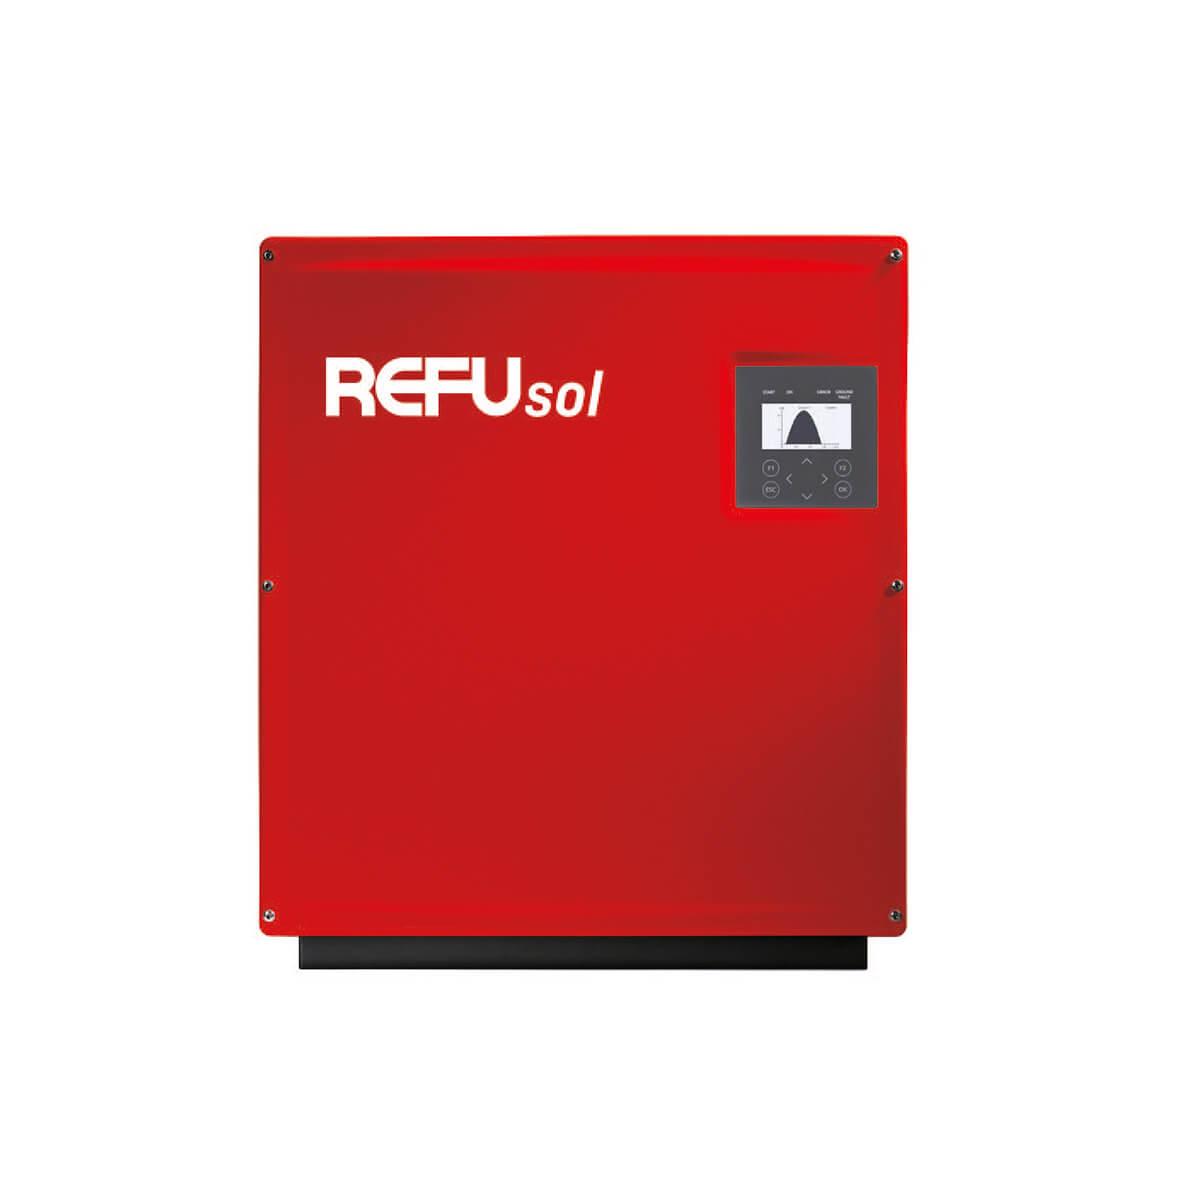 refusol 23kW inverter, refusol 23k-mv 23kW inverter, refusol 23k-mv inverter, refusol 23k-mv, refusol 23k-mv 23 kW